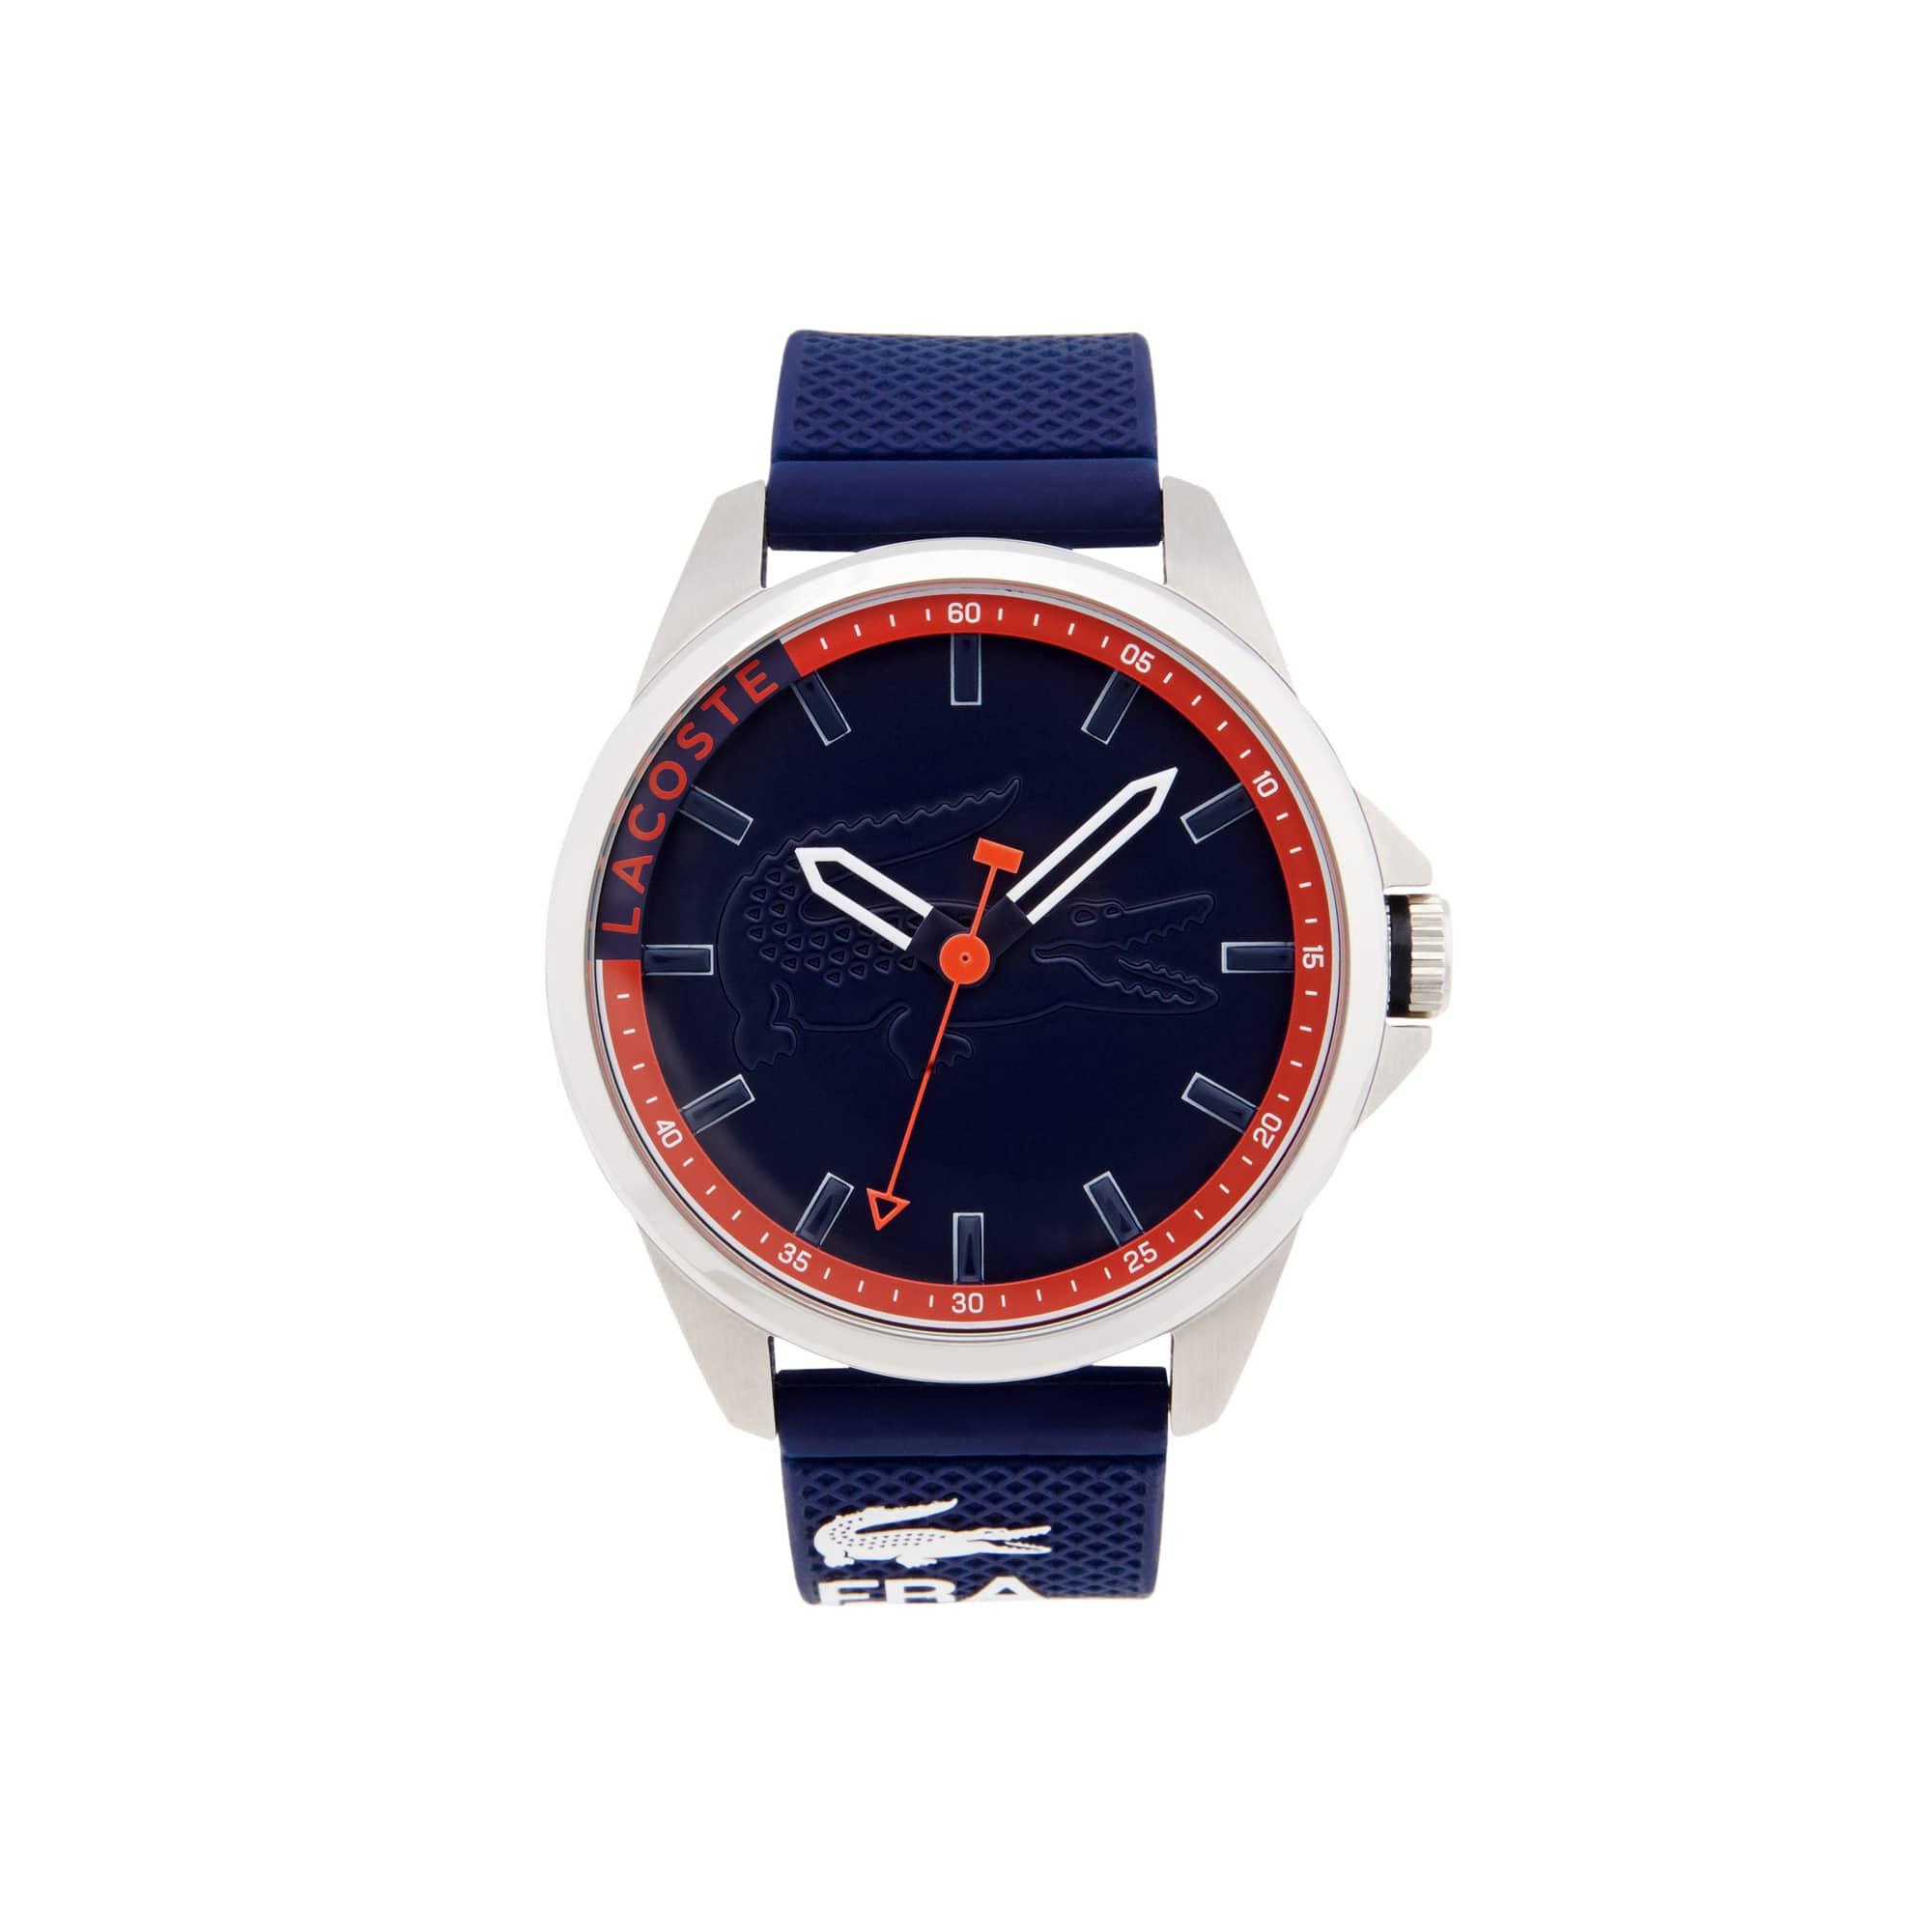 Men's Capbreton Watch with Black Silicone Strap